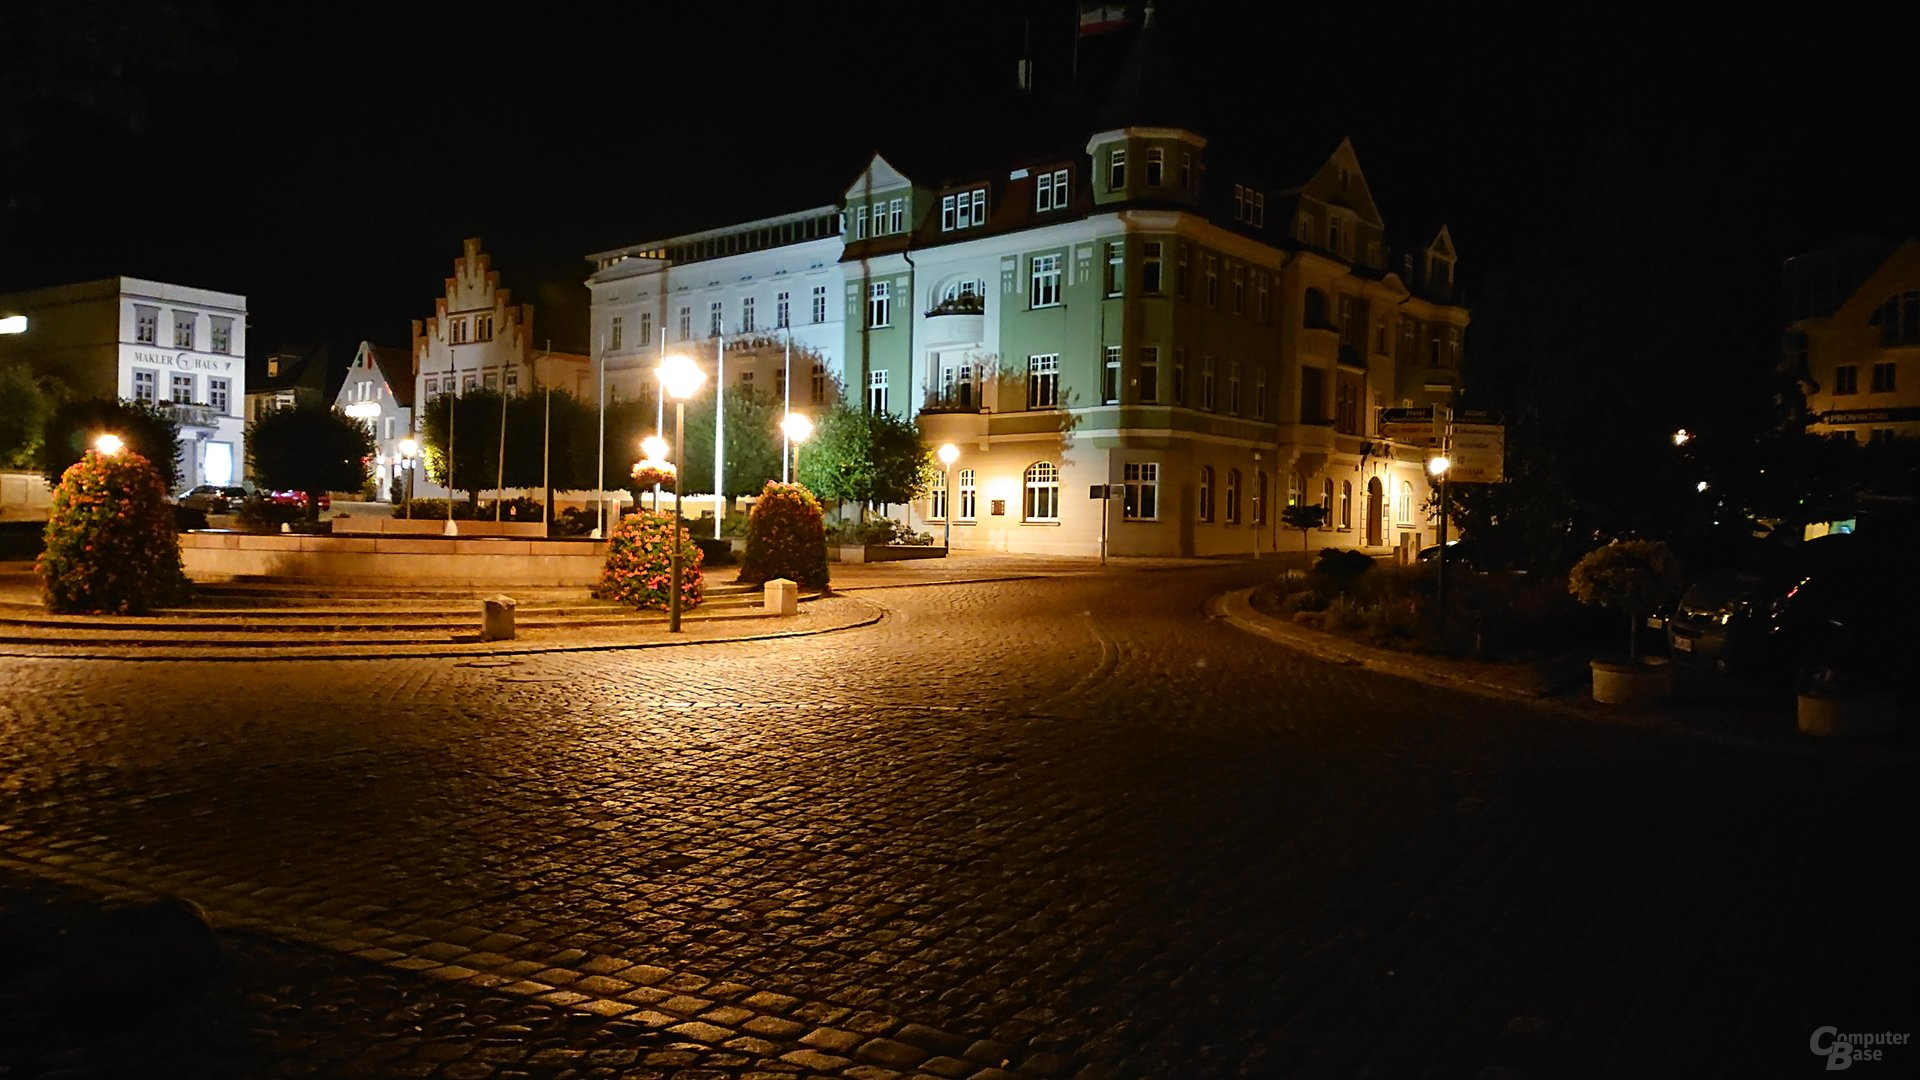 Nachtaufnahme, Duallinse, ISO 6400